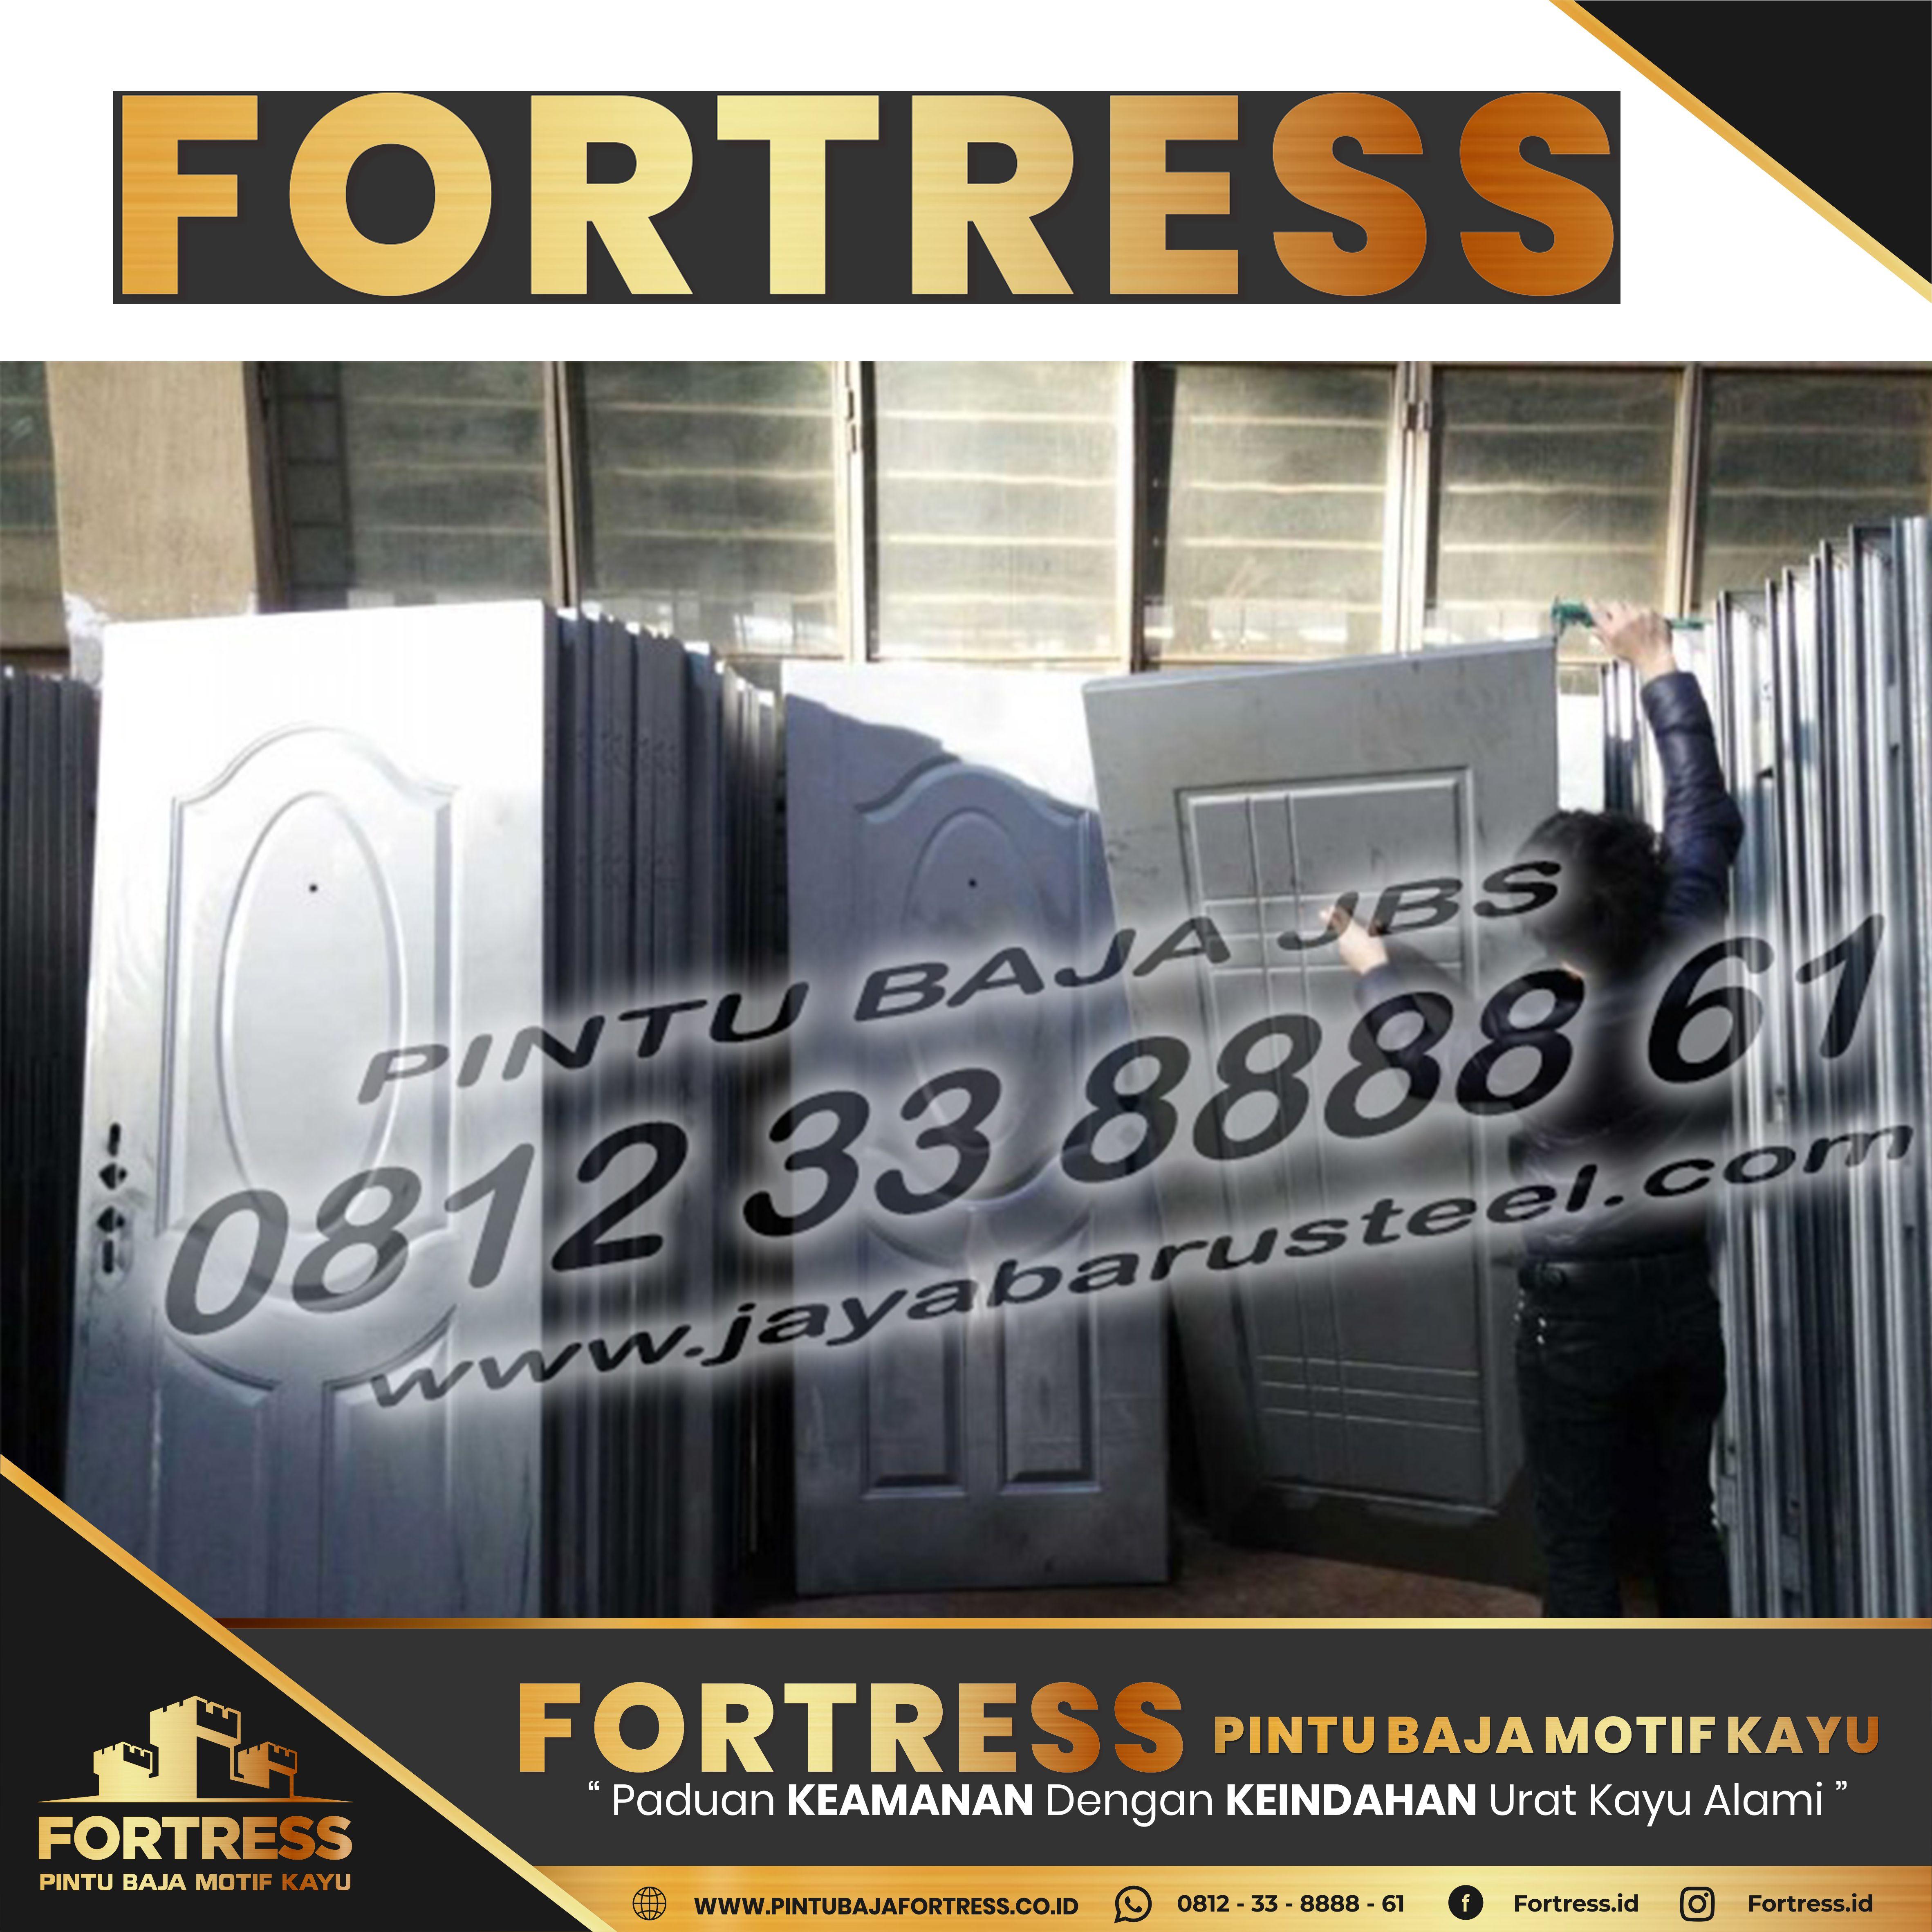 0812-91-6261-07 (FORTRESS) Steel Doors And Frame Samarinda, …